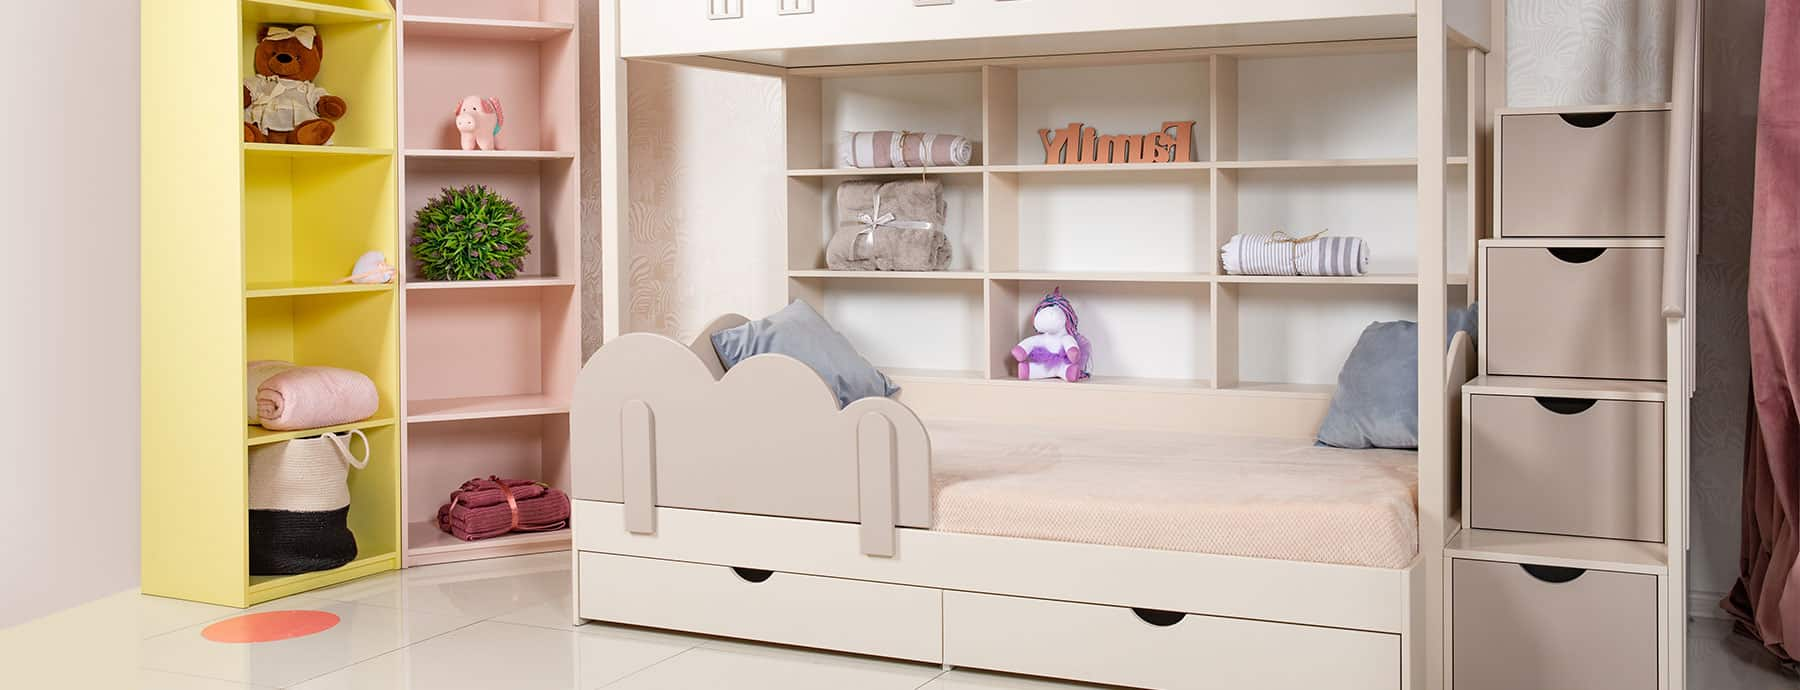 The Best Bunk Bed With Drawer Steps Nursery Kid S Room Decor Ideas My Sleepy Monkey